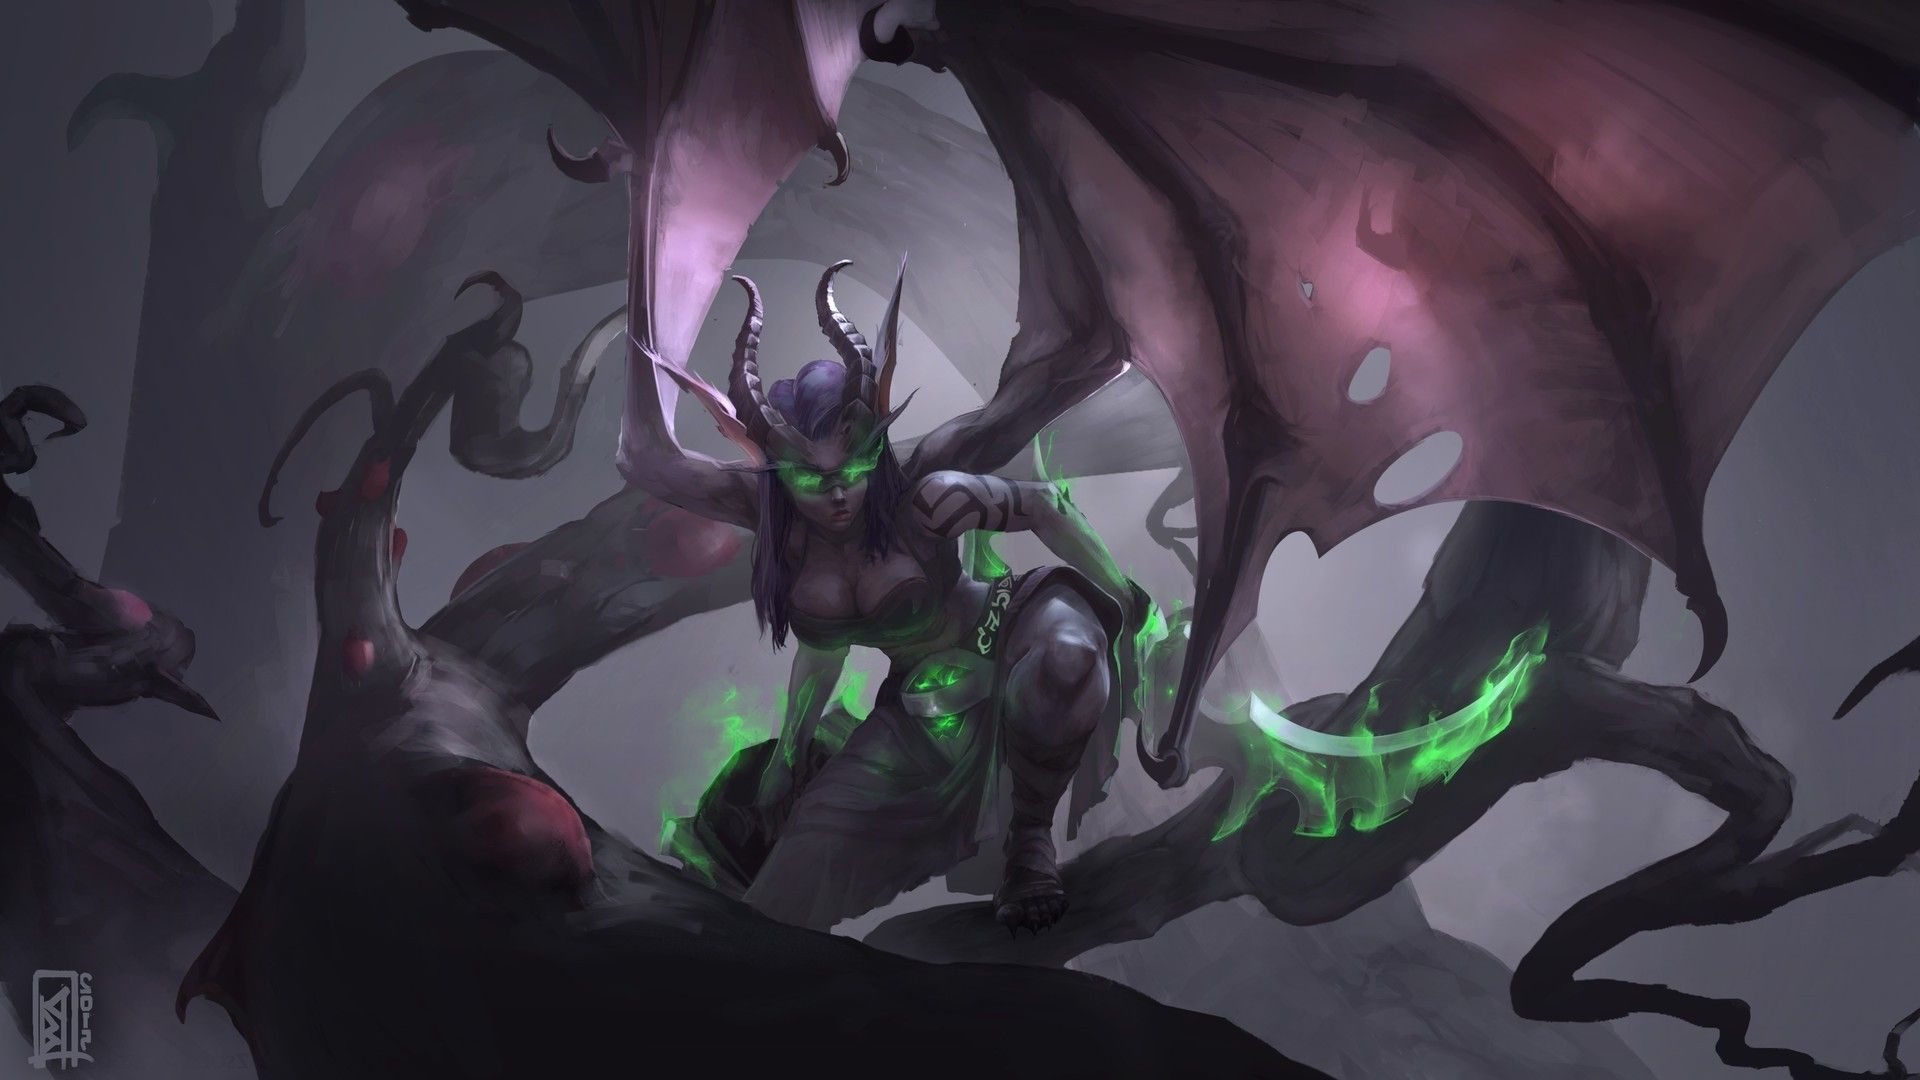 Demon Hunter Wallpapers Top Free Demon Hunter Backgrounds Wallpaperaccess